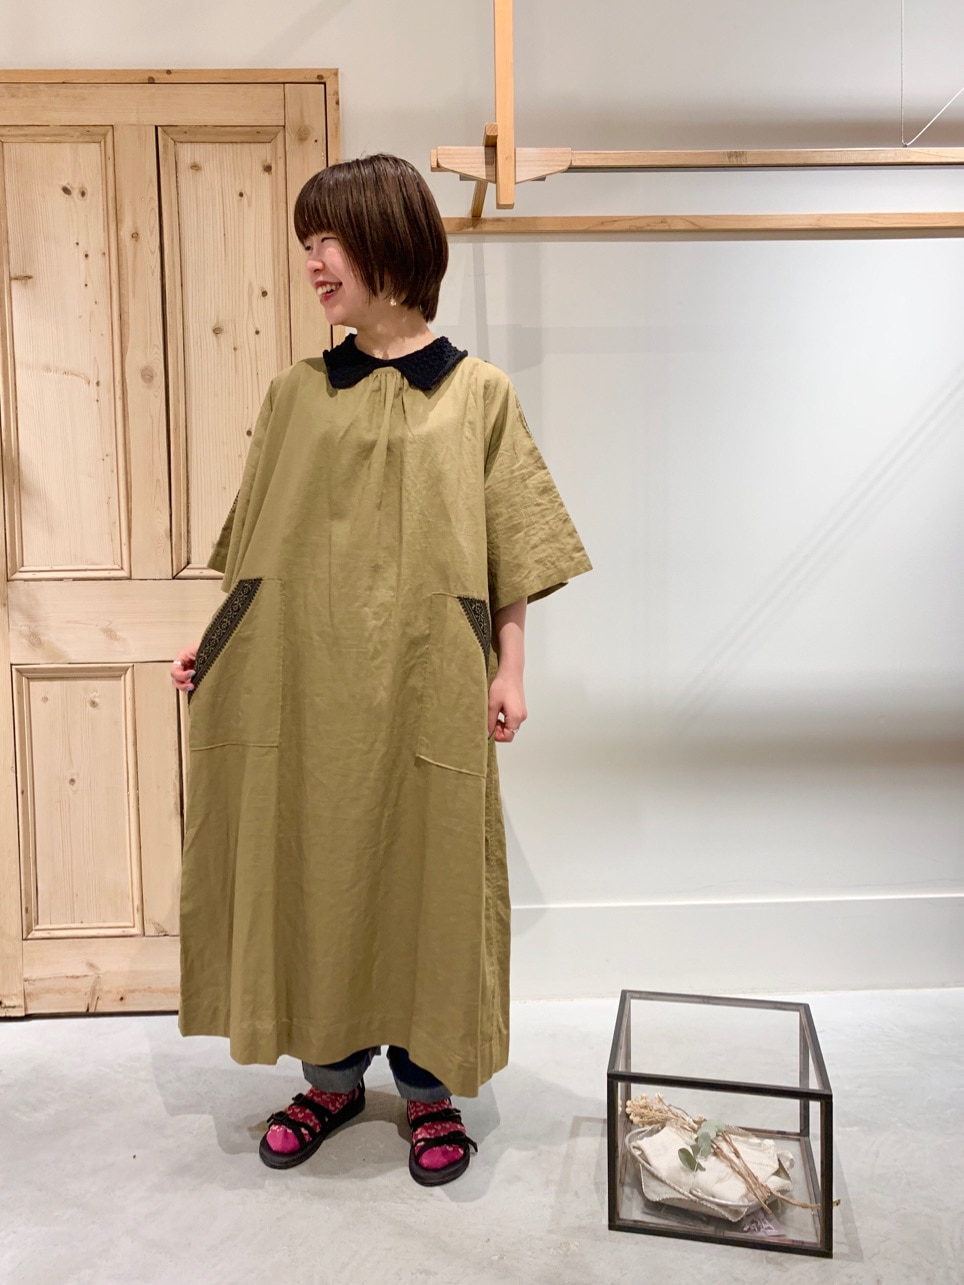 Malle chambre de charme 調布パルコ 身長:153cm 2020.06.22